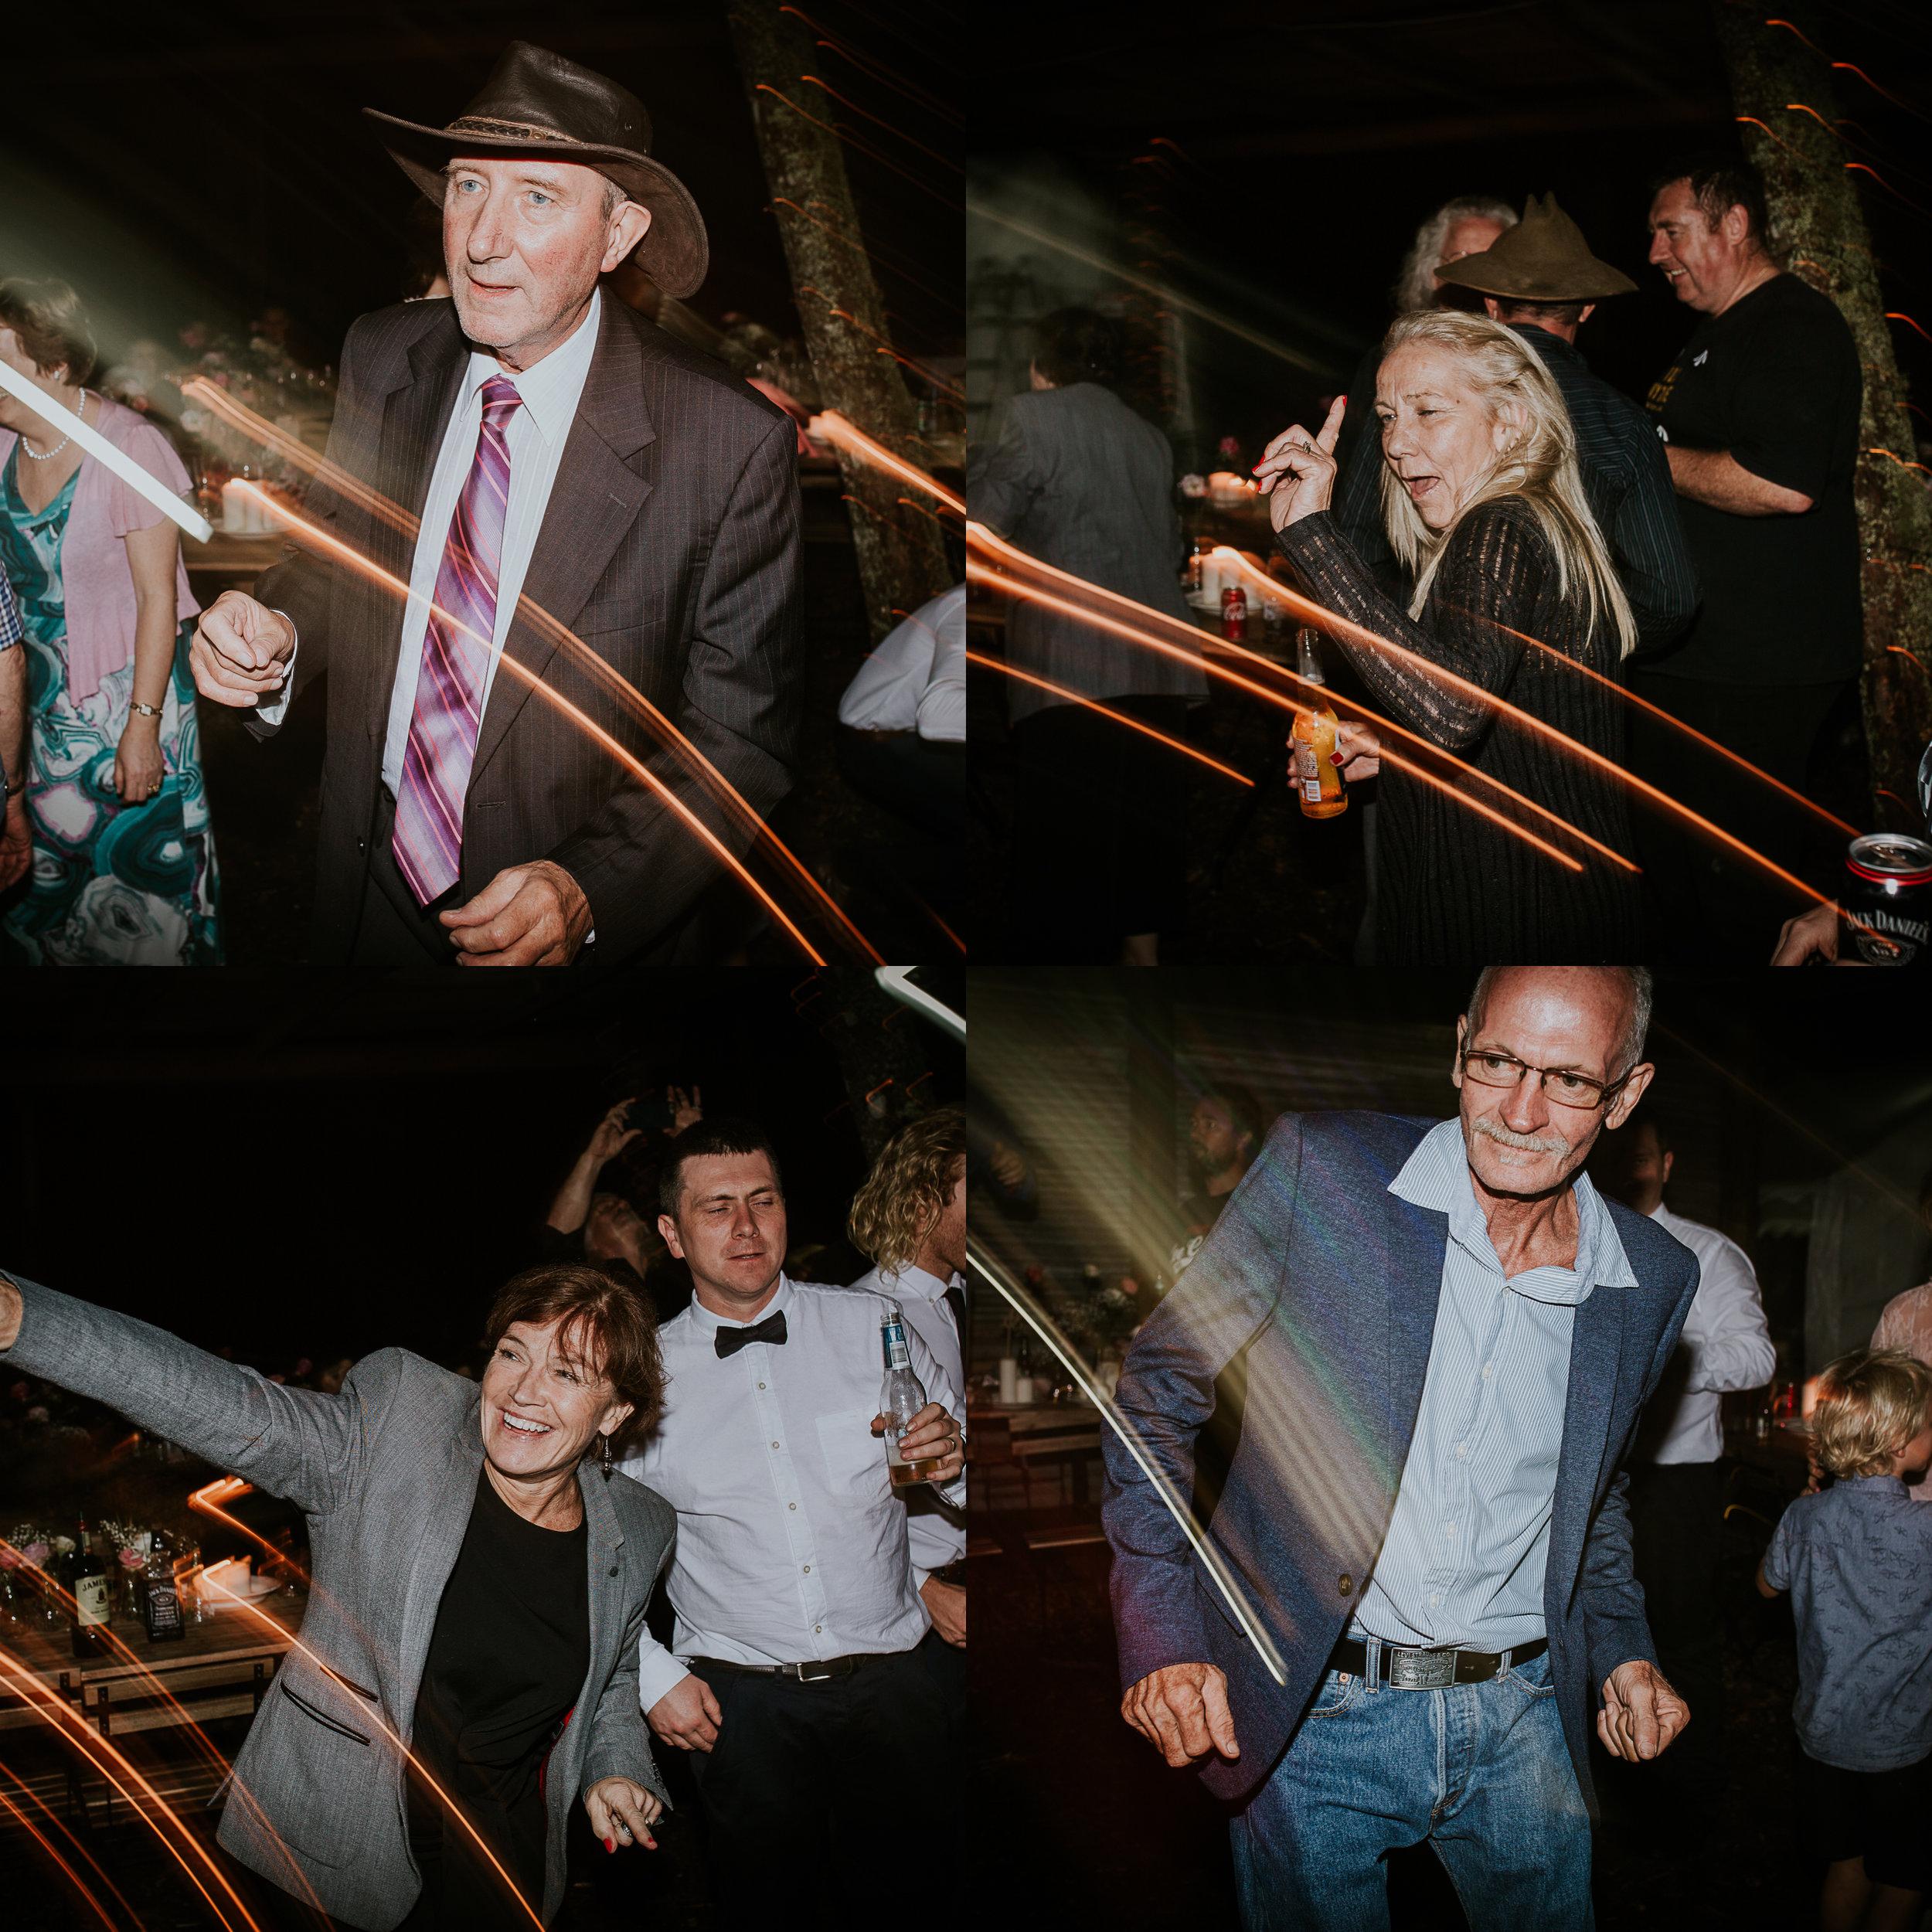 Dancefloor+fun+john+Emma+Wedstival.jpg